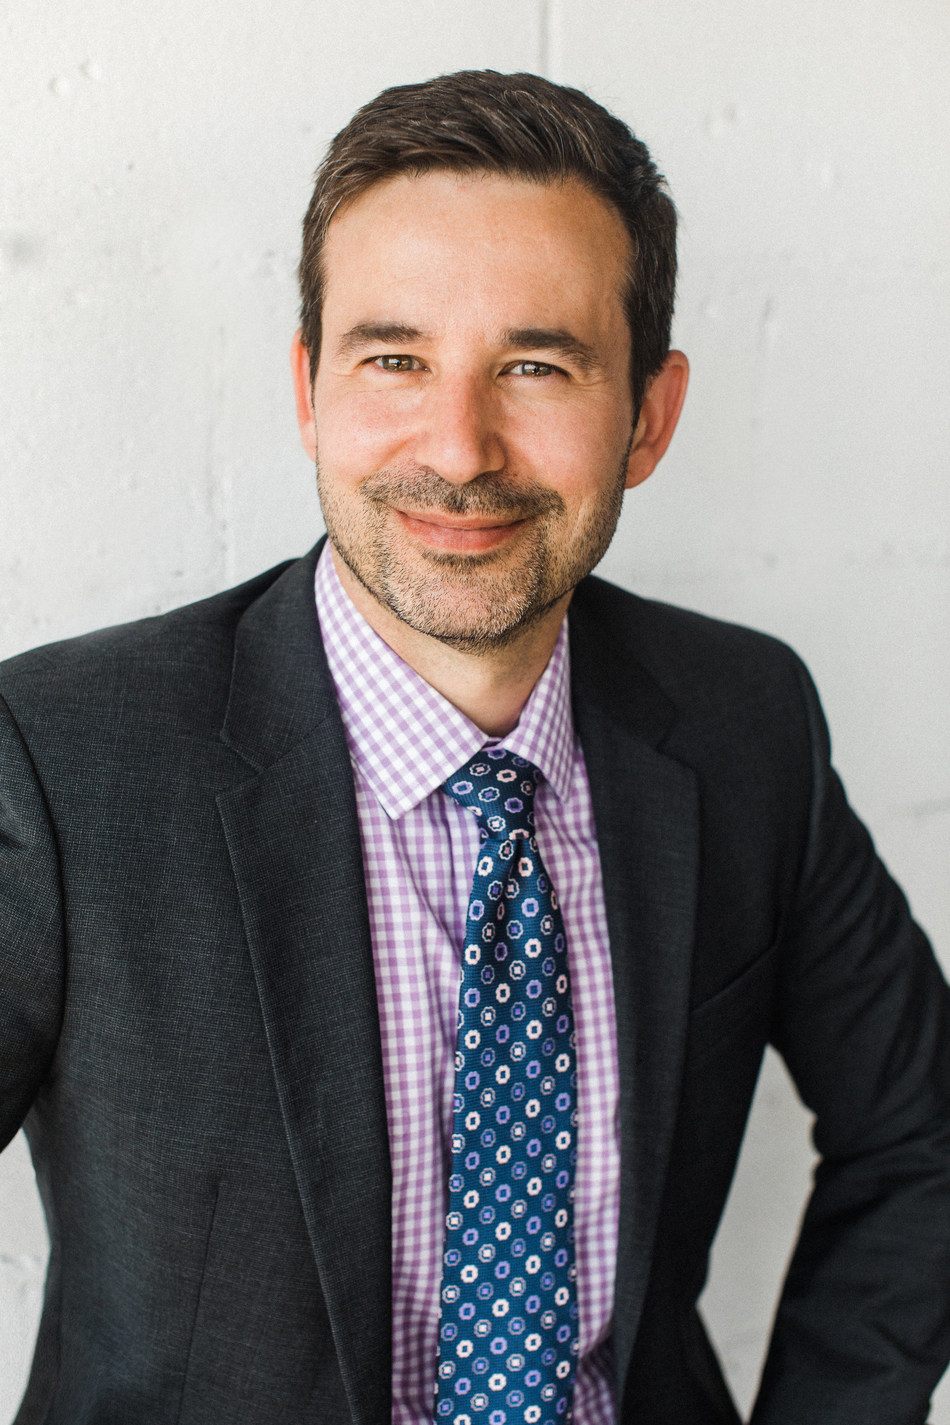 Jeff Roman, Senior Vice President, Integrated Communications (CNW Group/Apex Public Relations)